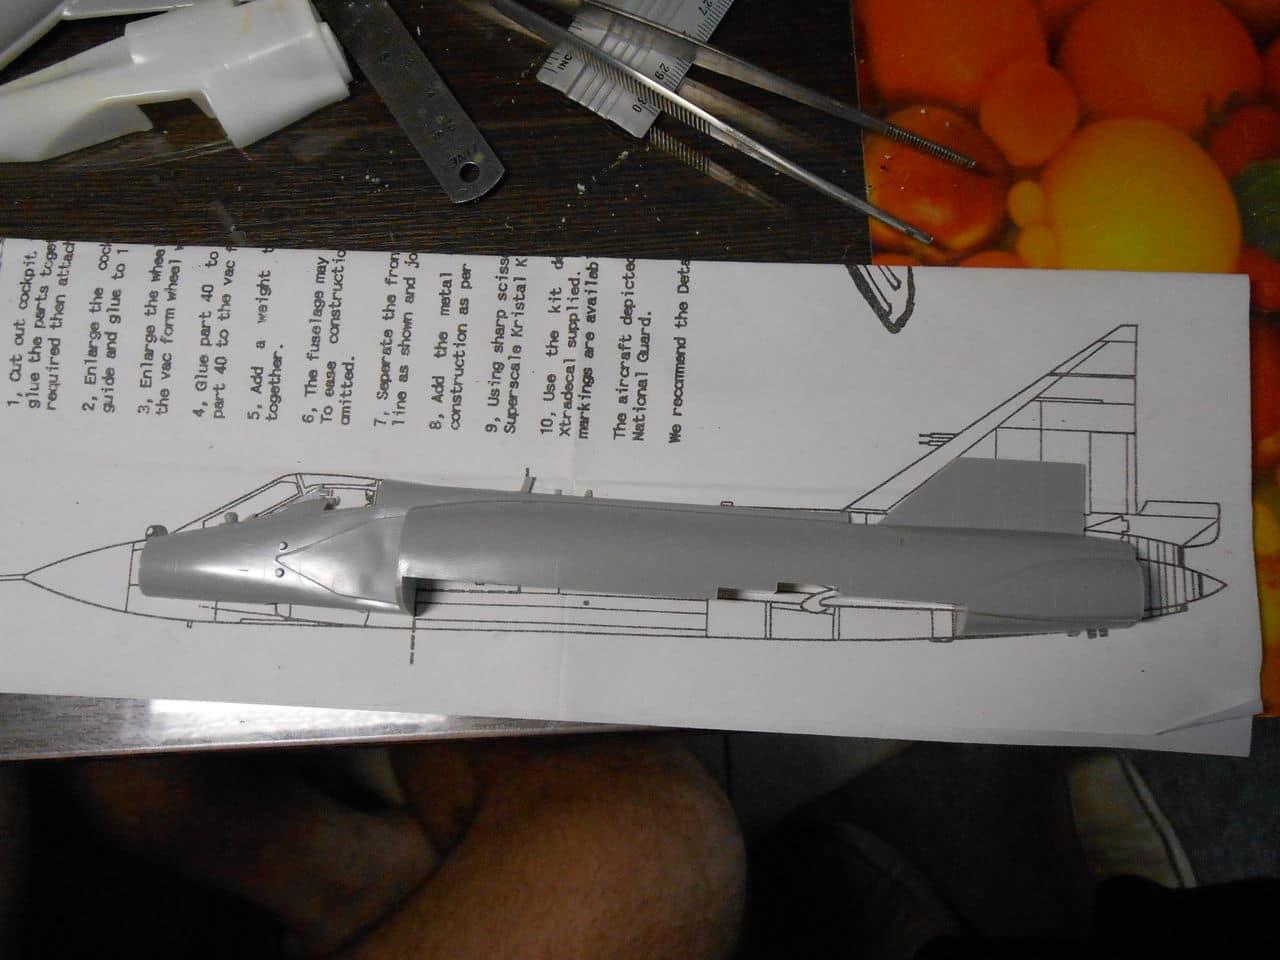 TF-102A delta dagger HAF DSCN1100